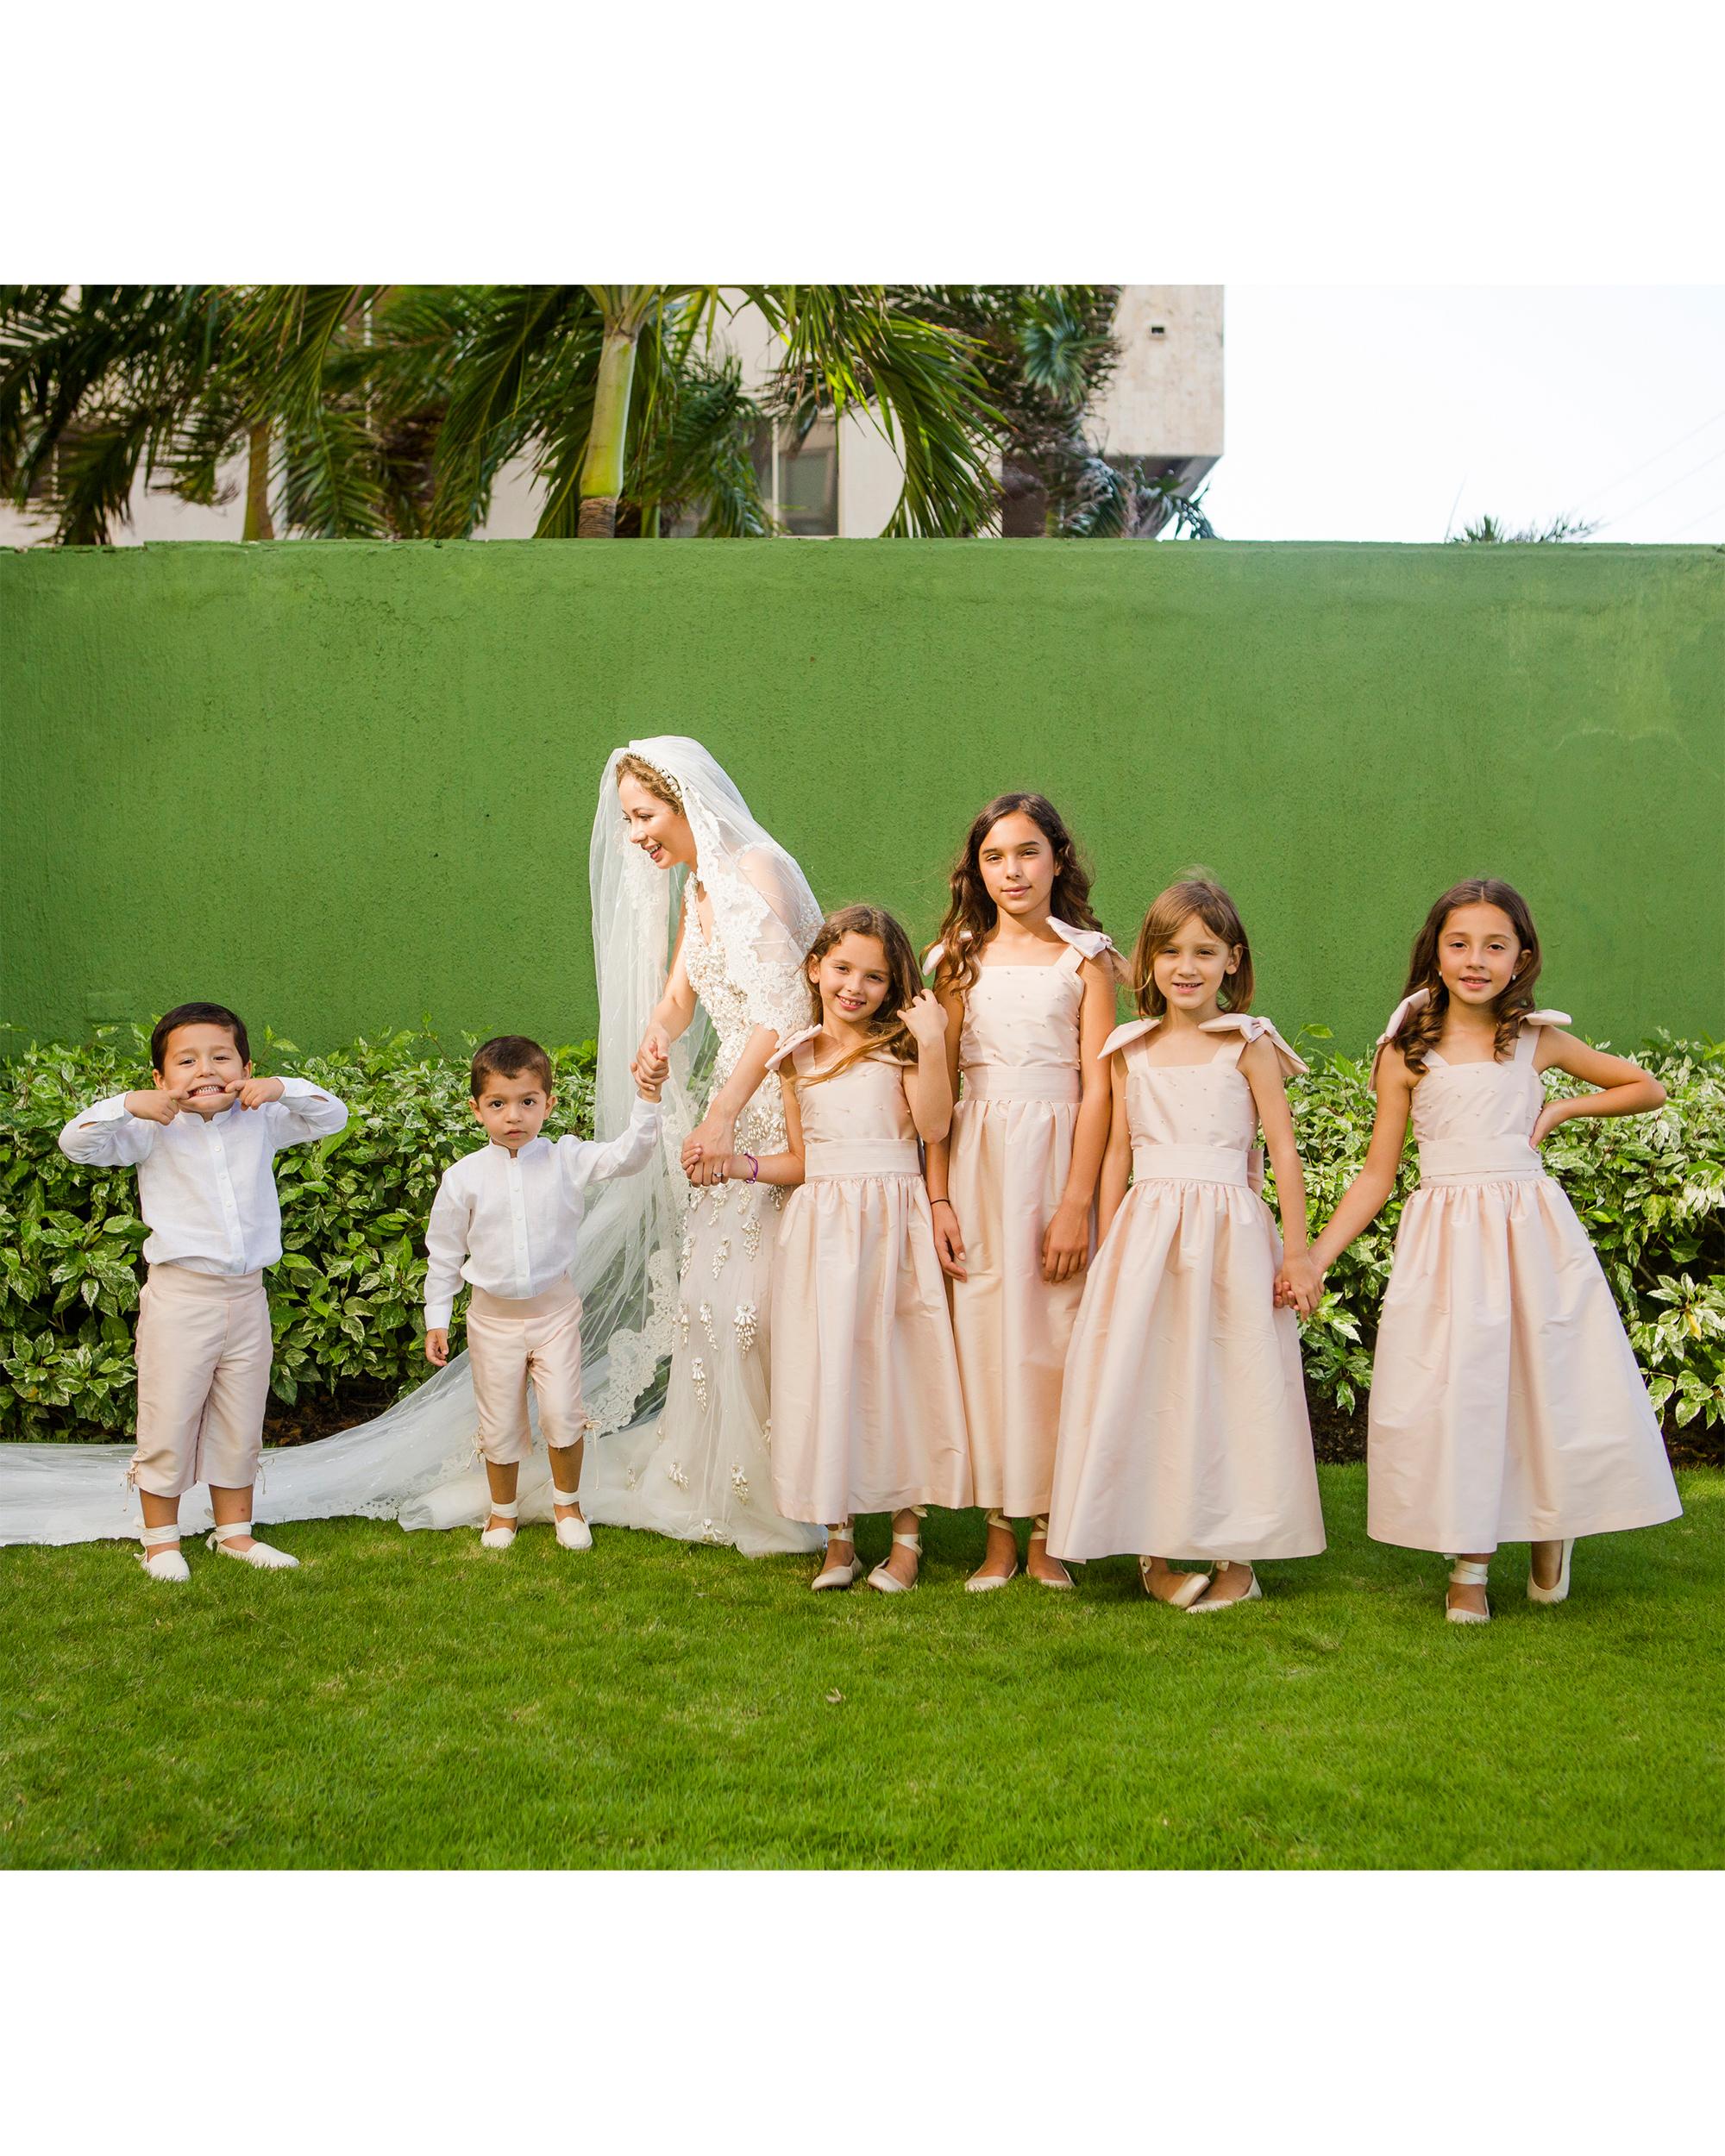 cristina andre wedding kids